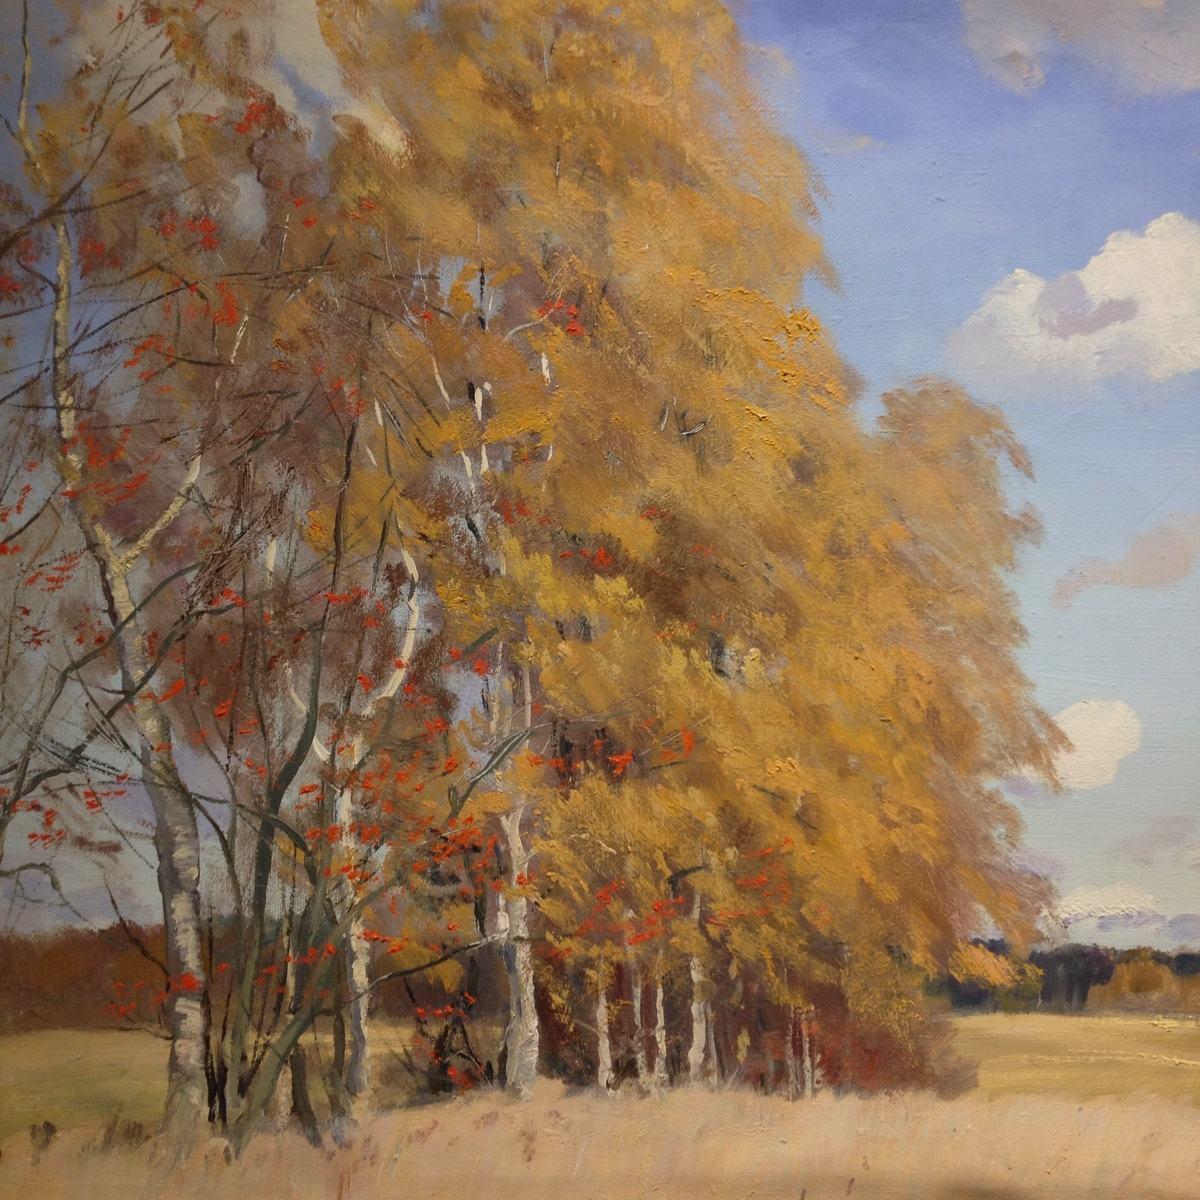 Russian oil painting,俄罗斯油画朴素语言,essay代写,paper代写,作业代写